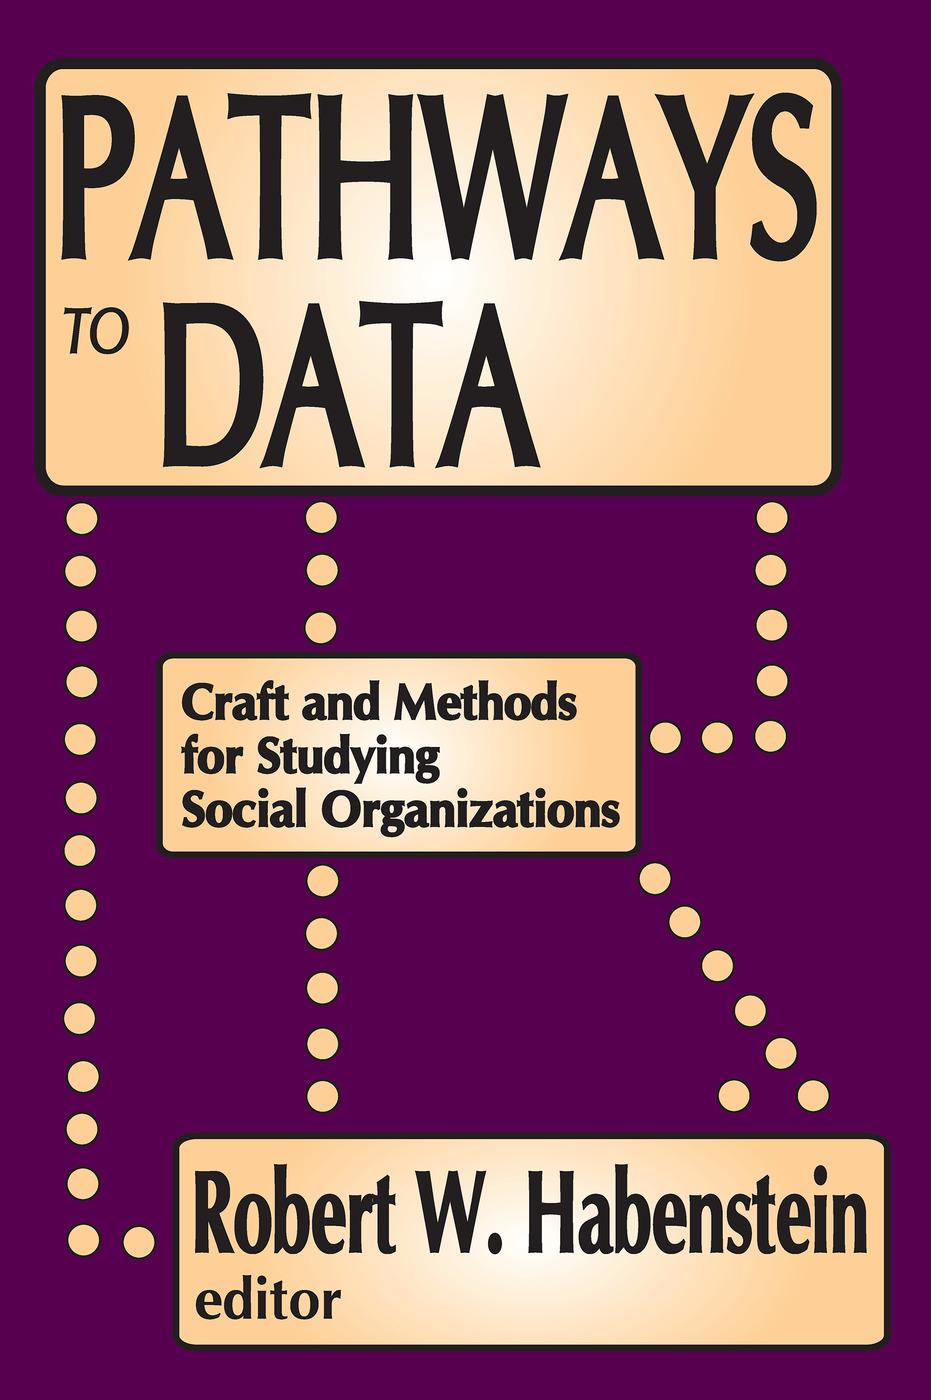 Pathways to Data